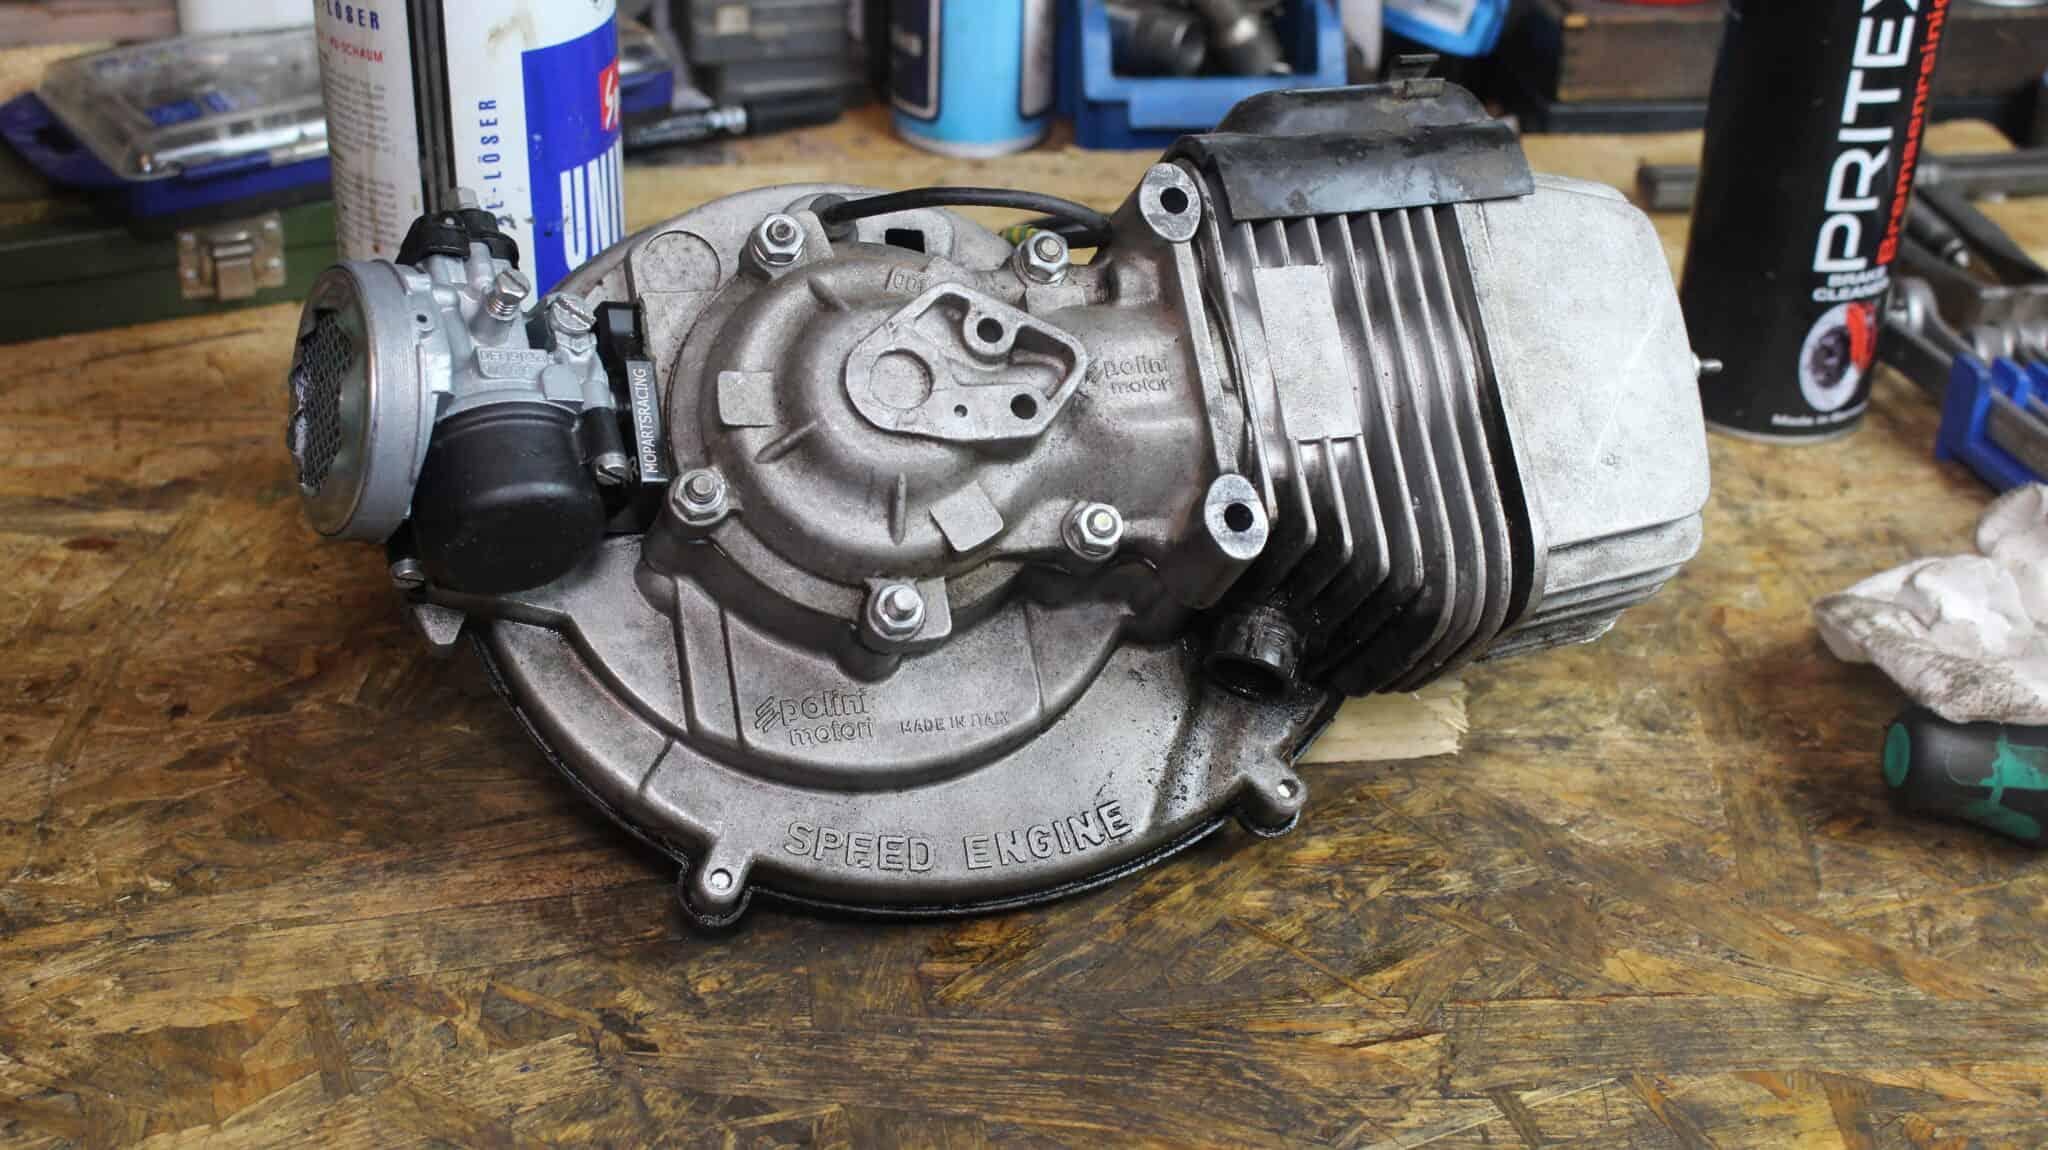 Polini Speed Engine Tuning Setup Piaggio Ciao